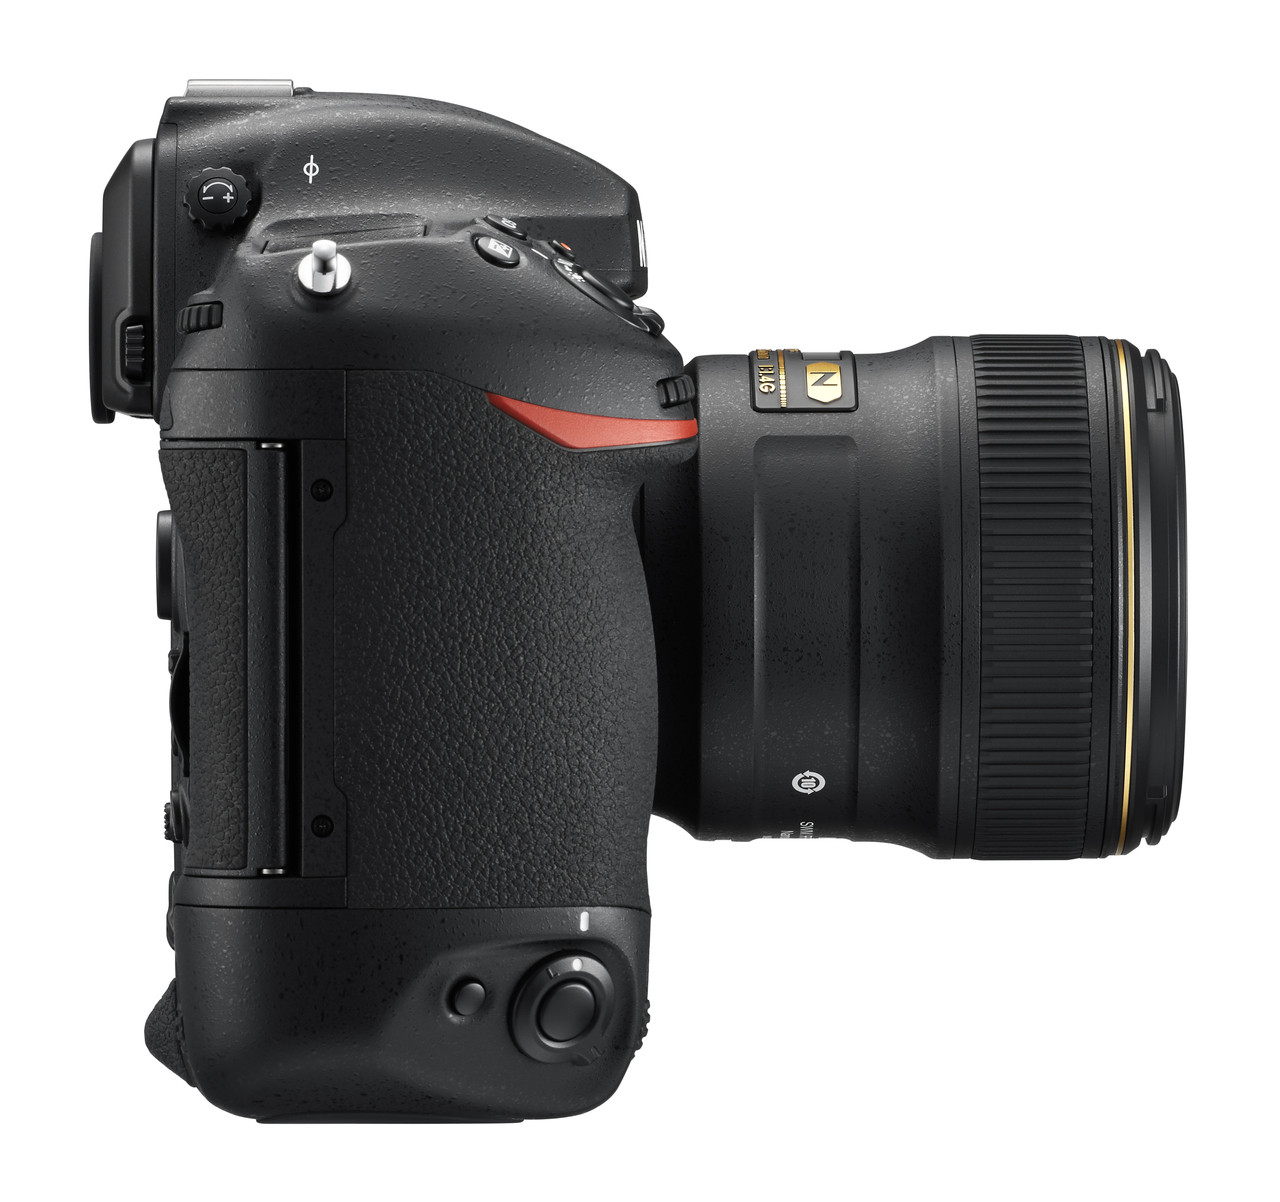 Nikon D5 Right Side